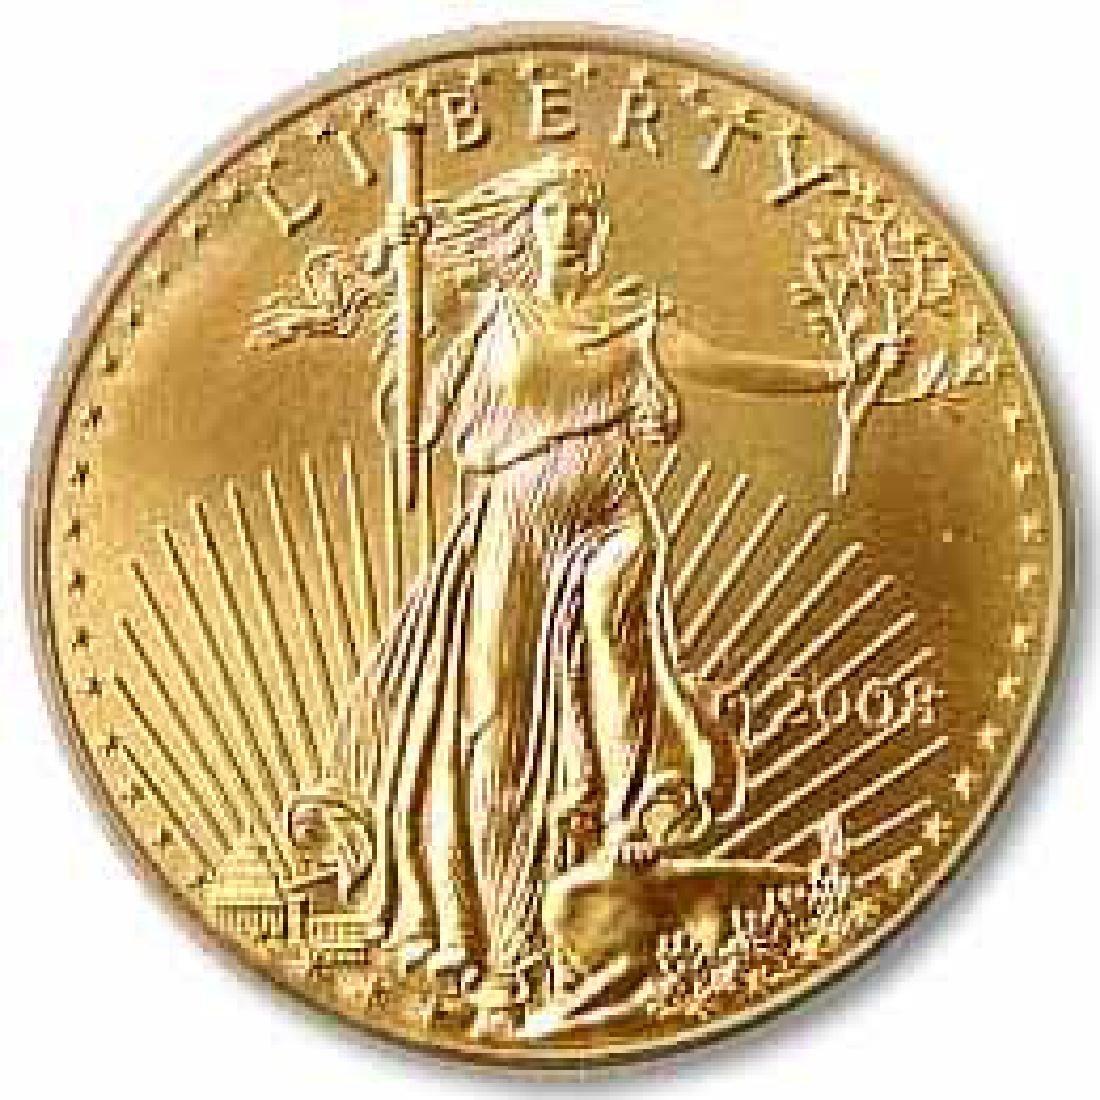 2008 American Gold Eagle 1 oz Uncirculated